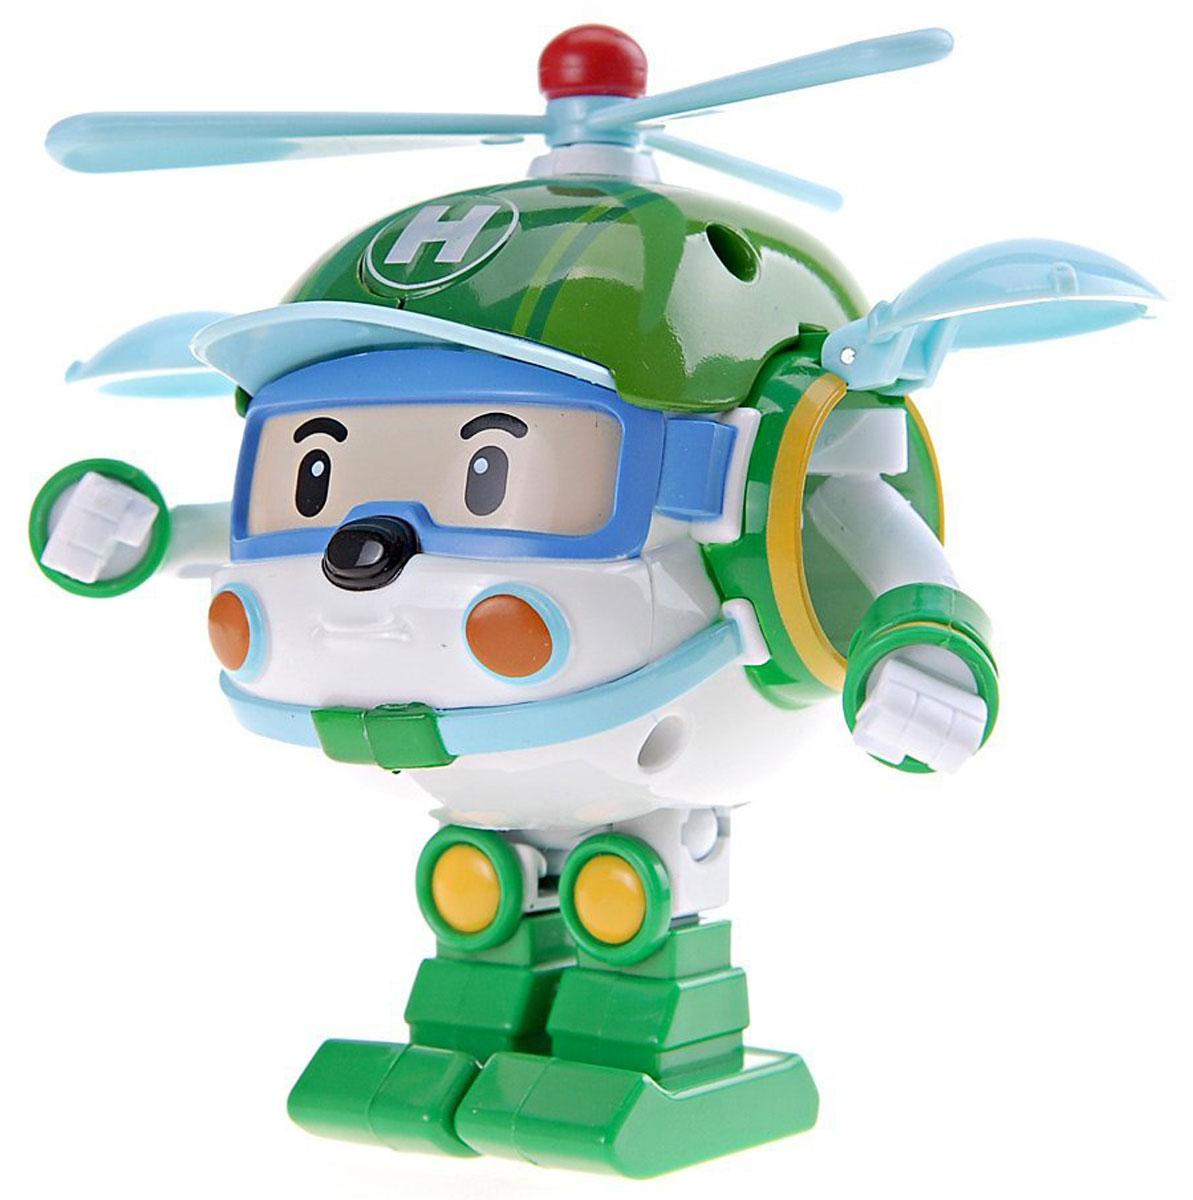 Robocar Poli Игрушка-трансформер Хэли 10 см robocar poli хэли 15см 83193